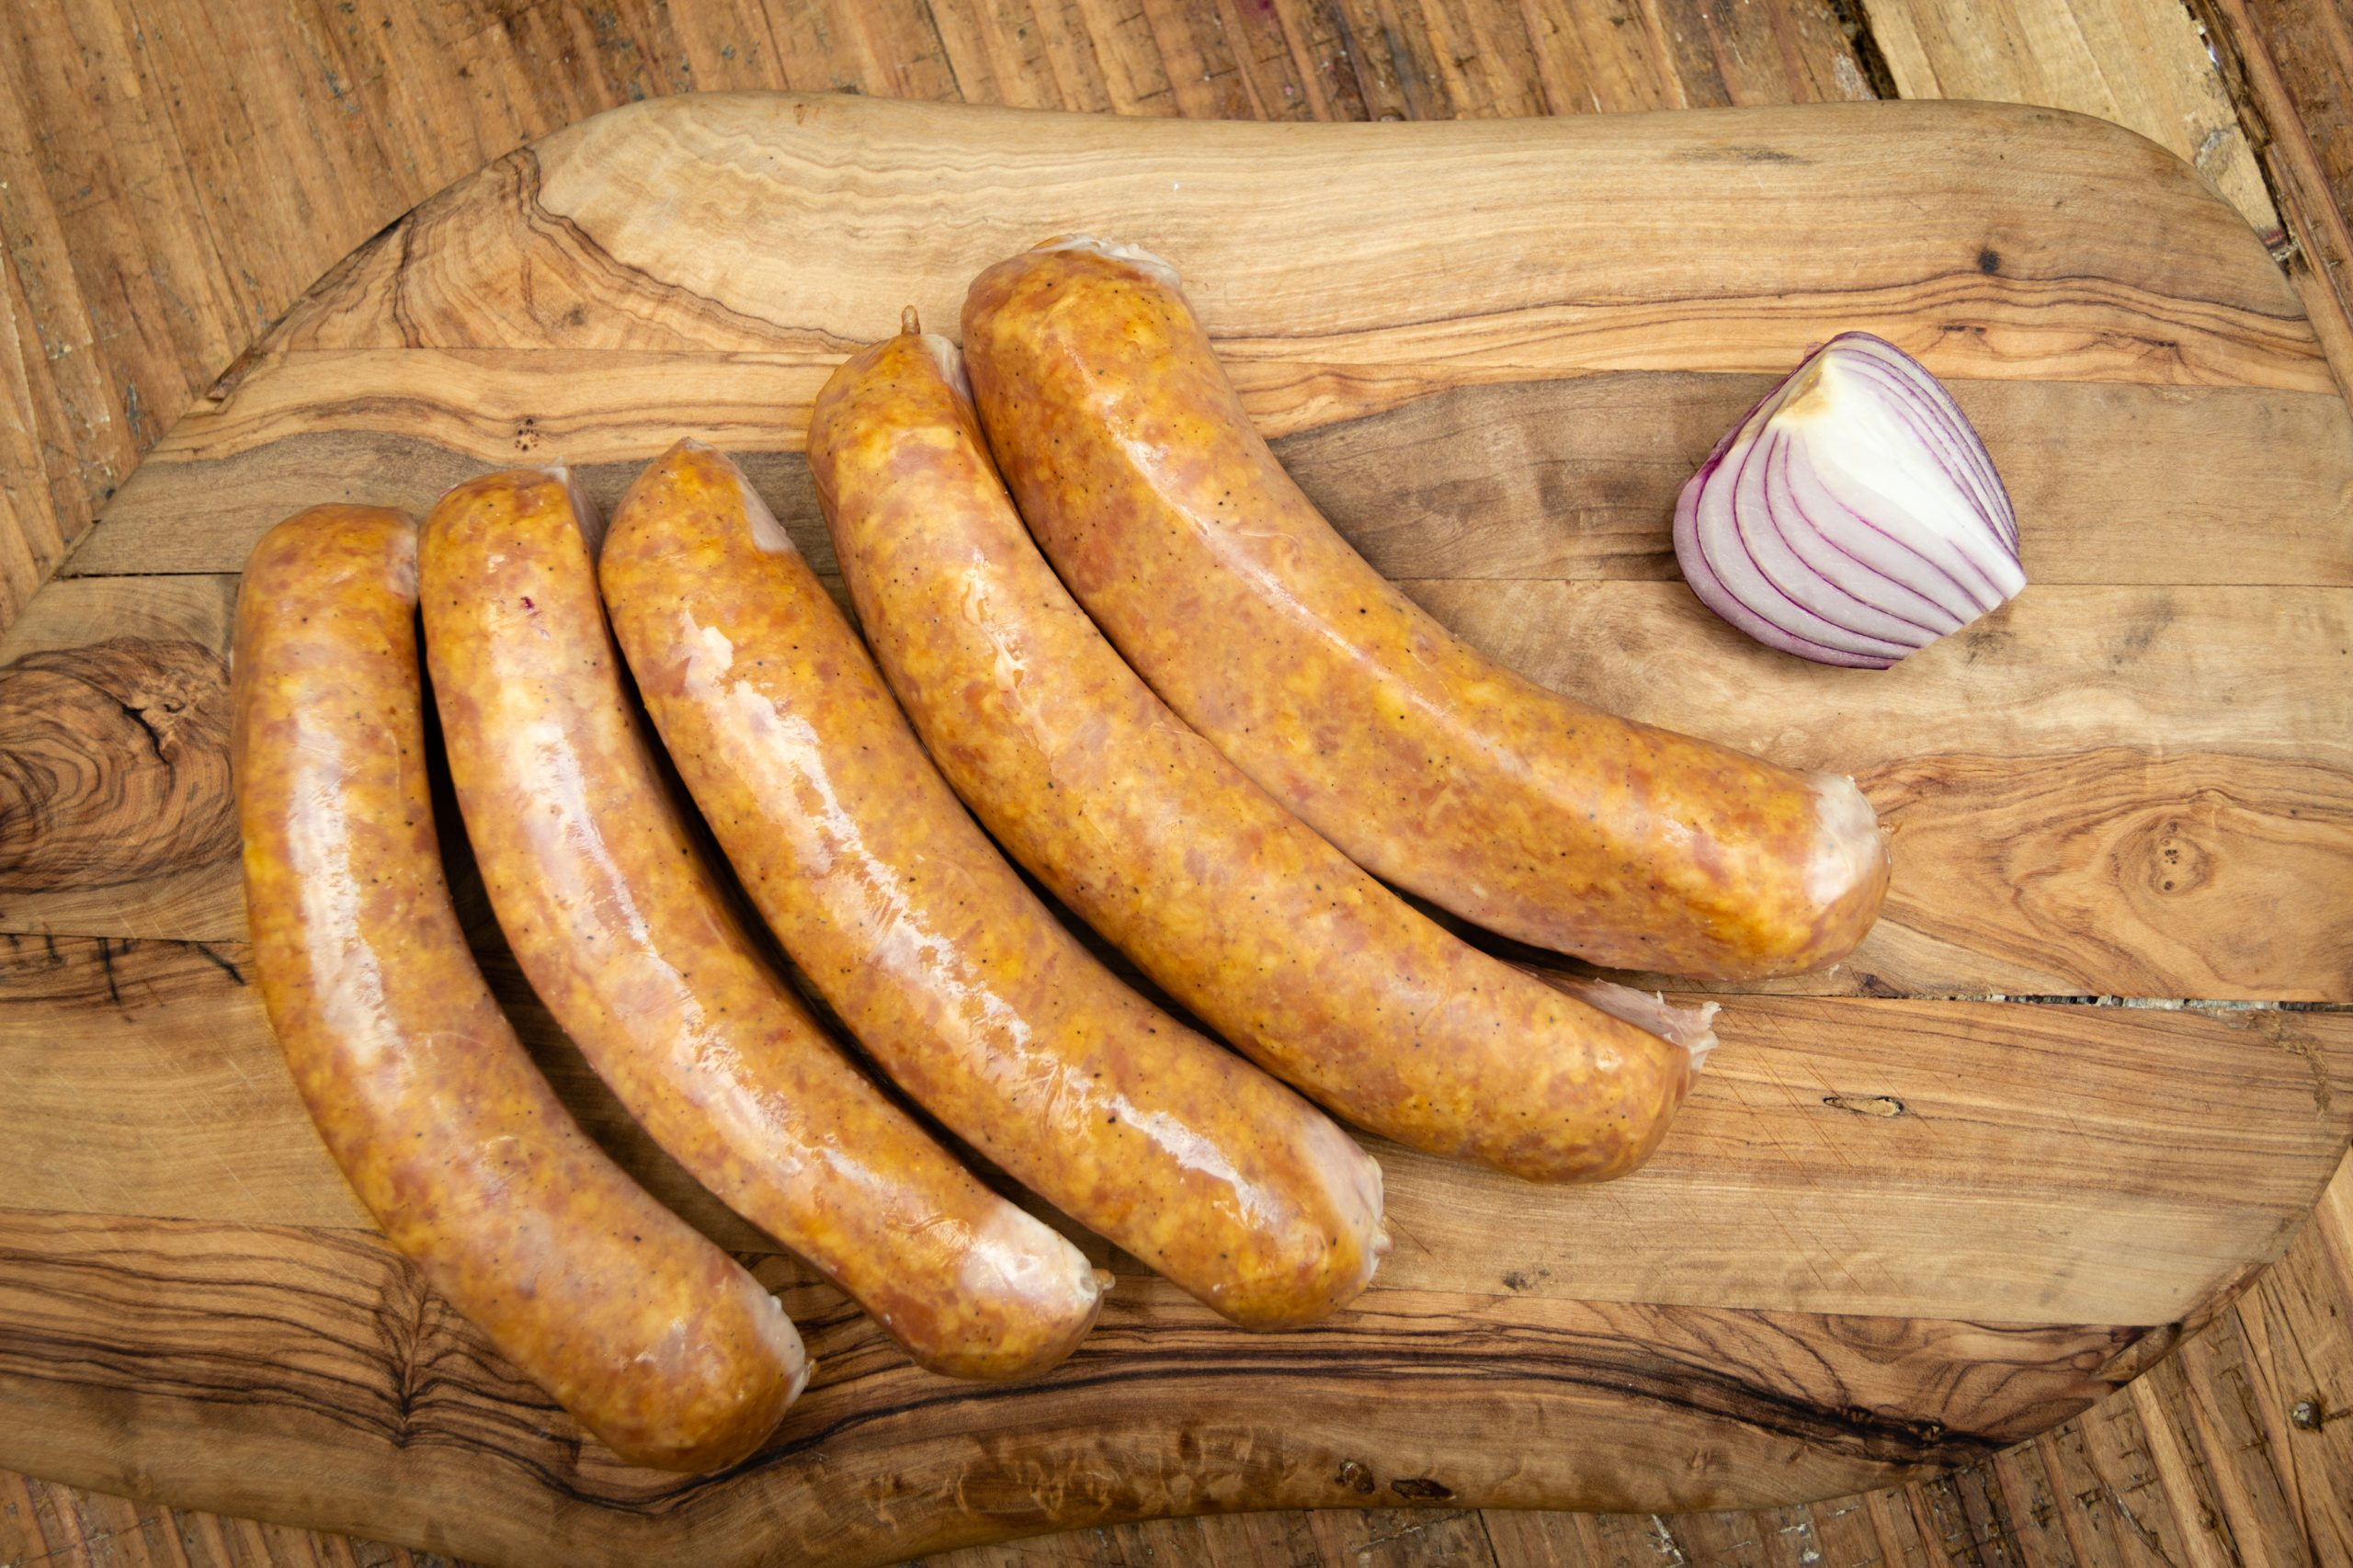 A smoky bratwurst-style sausage